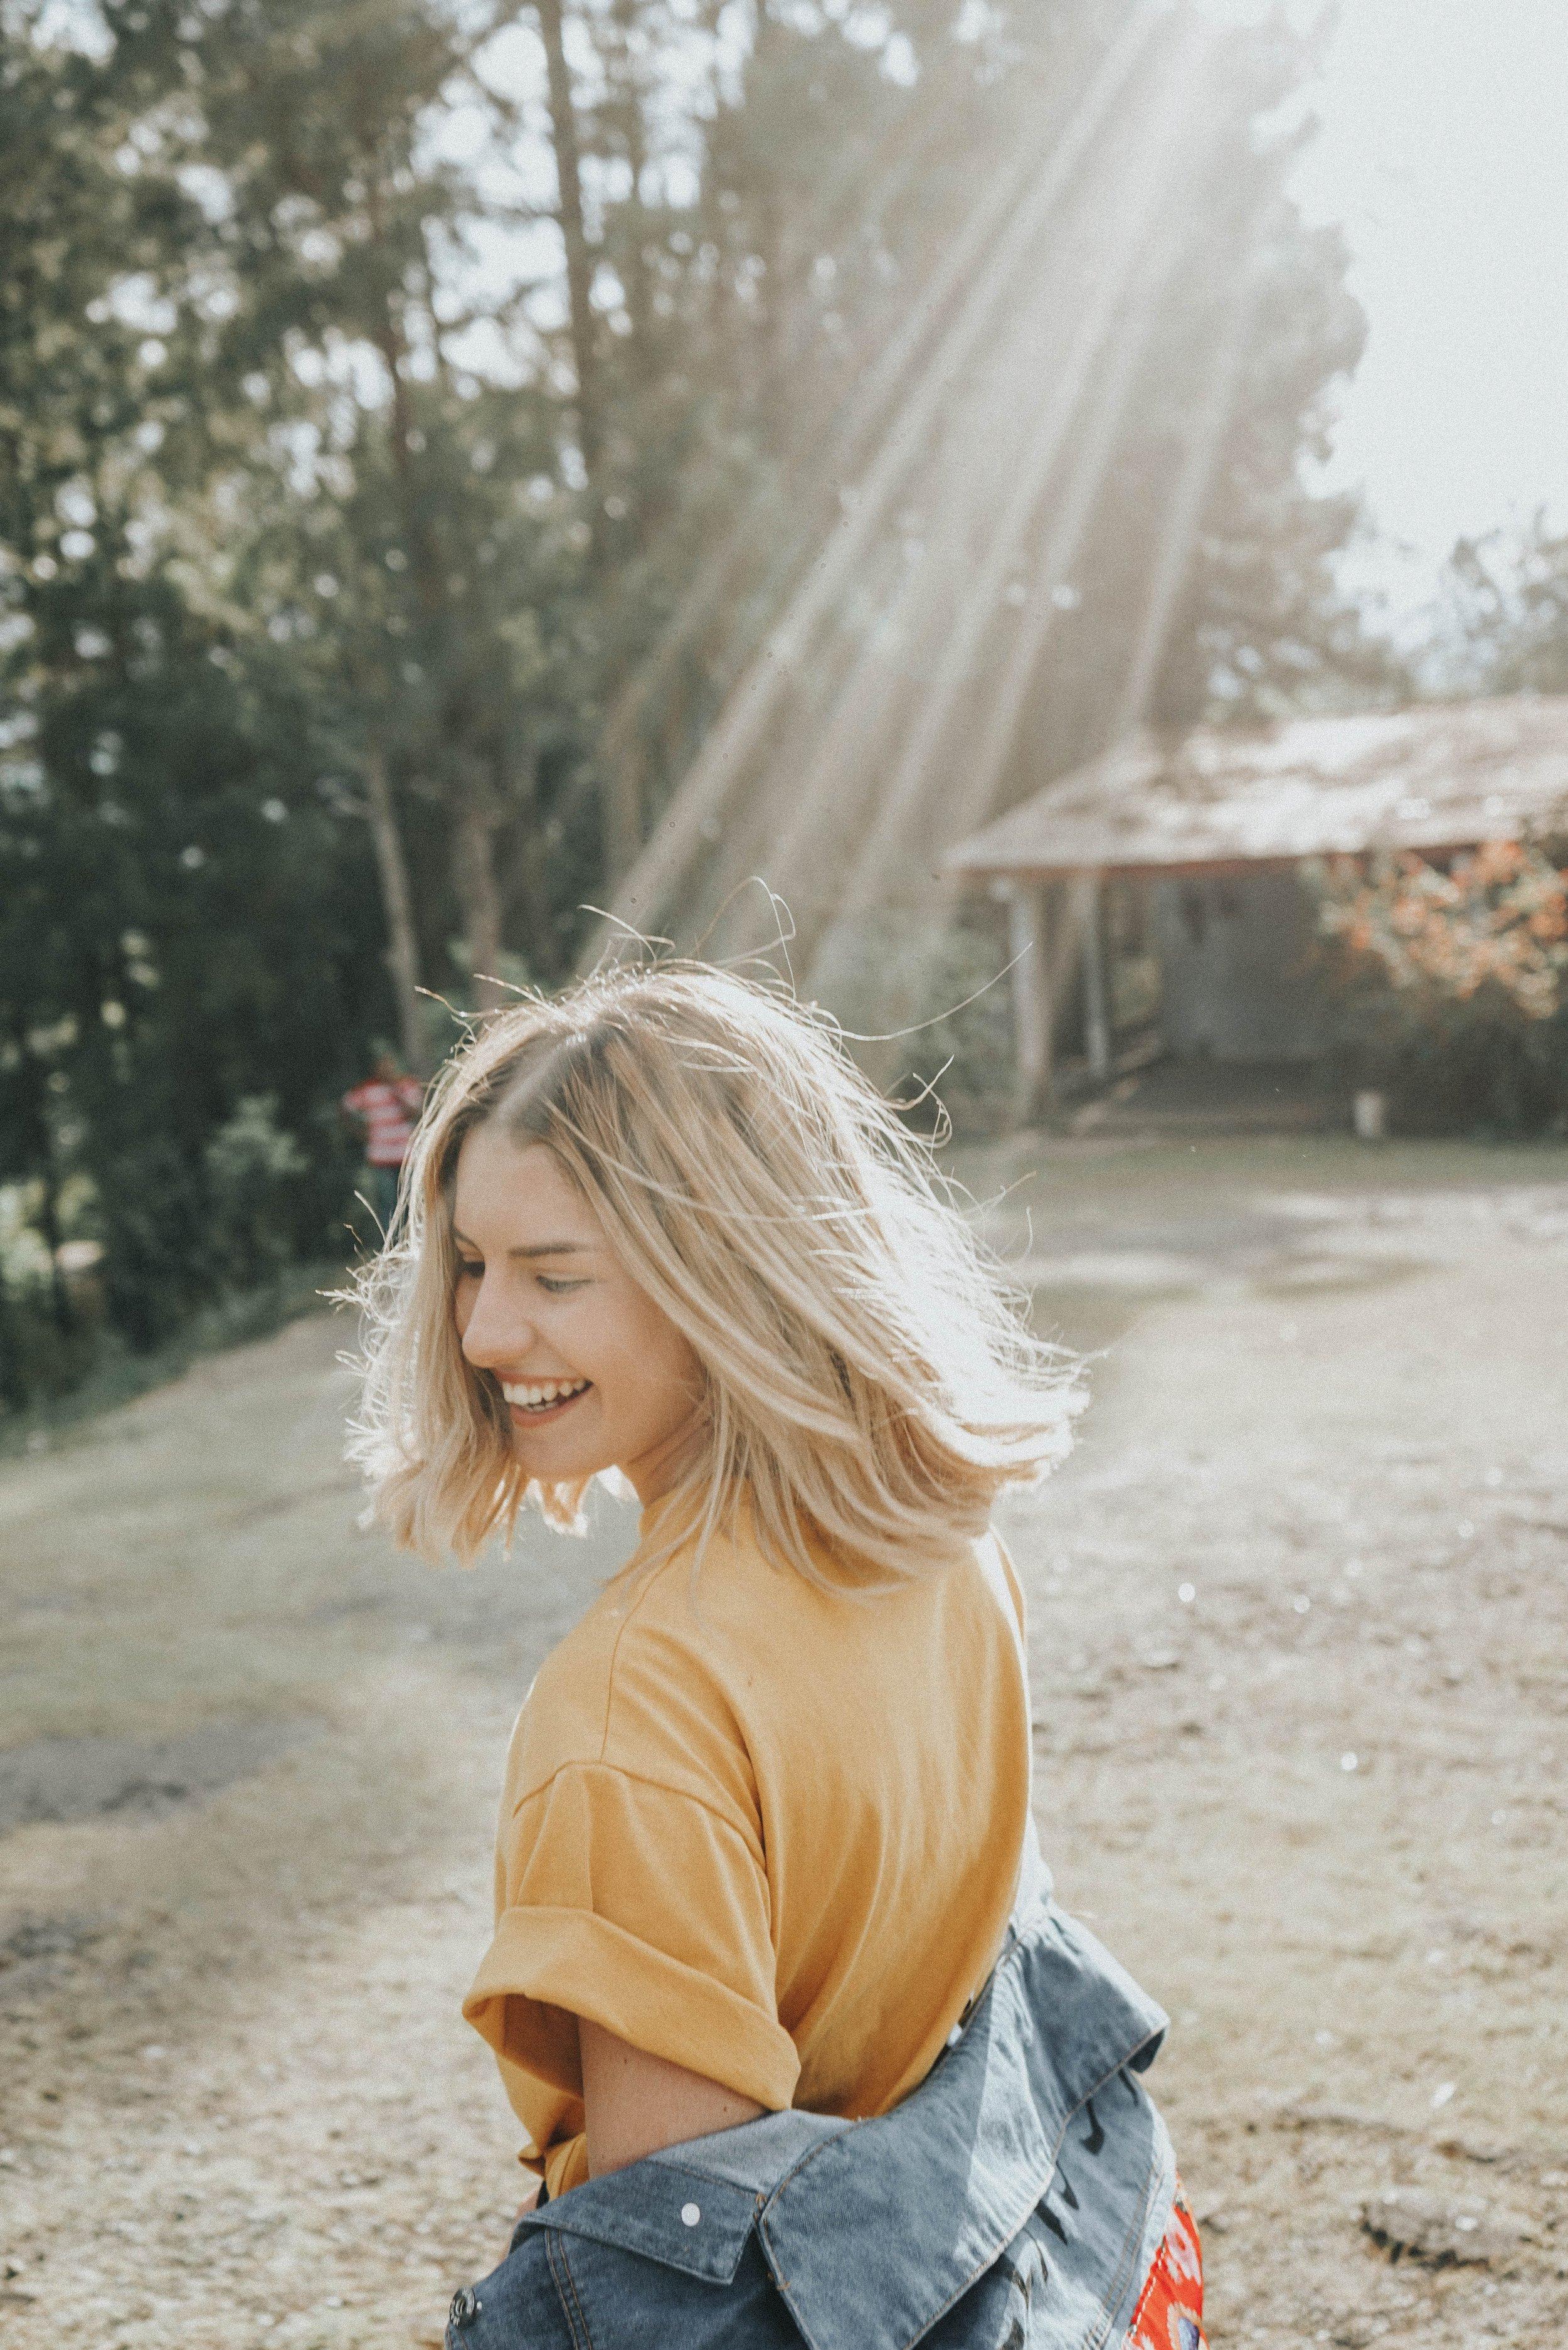 hope+wellness mclean top psychologist victoria smith 2.jpg